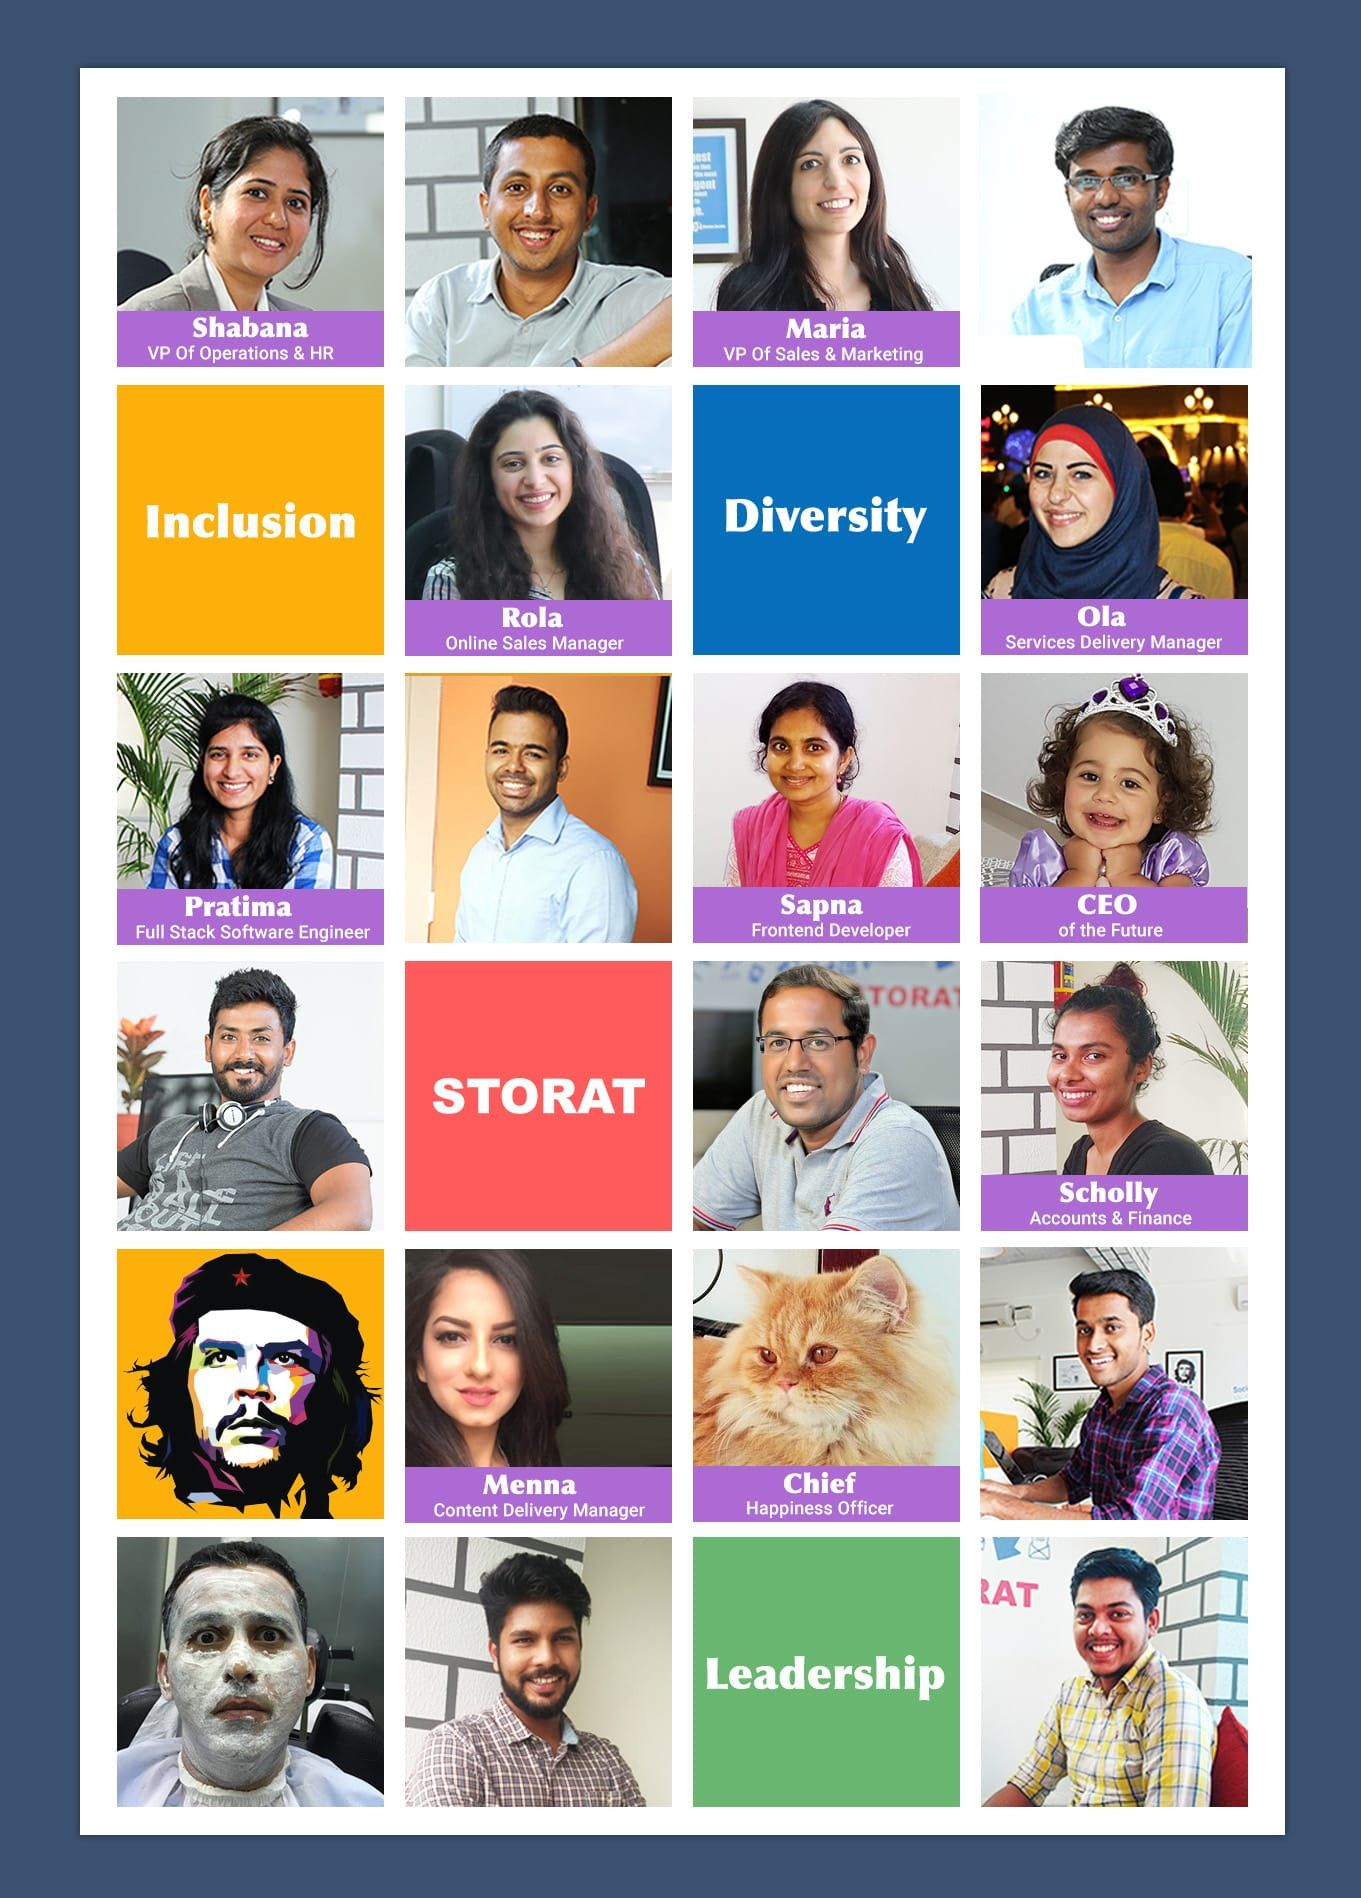 Celebrating Women Entrepreneurs & Leadership in the Middle East Tech startups. Storat achieves 50% diversity